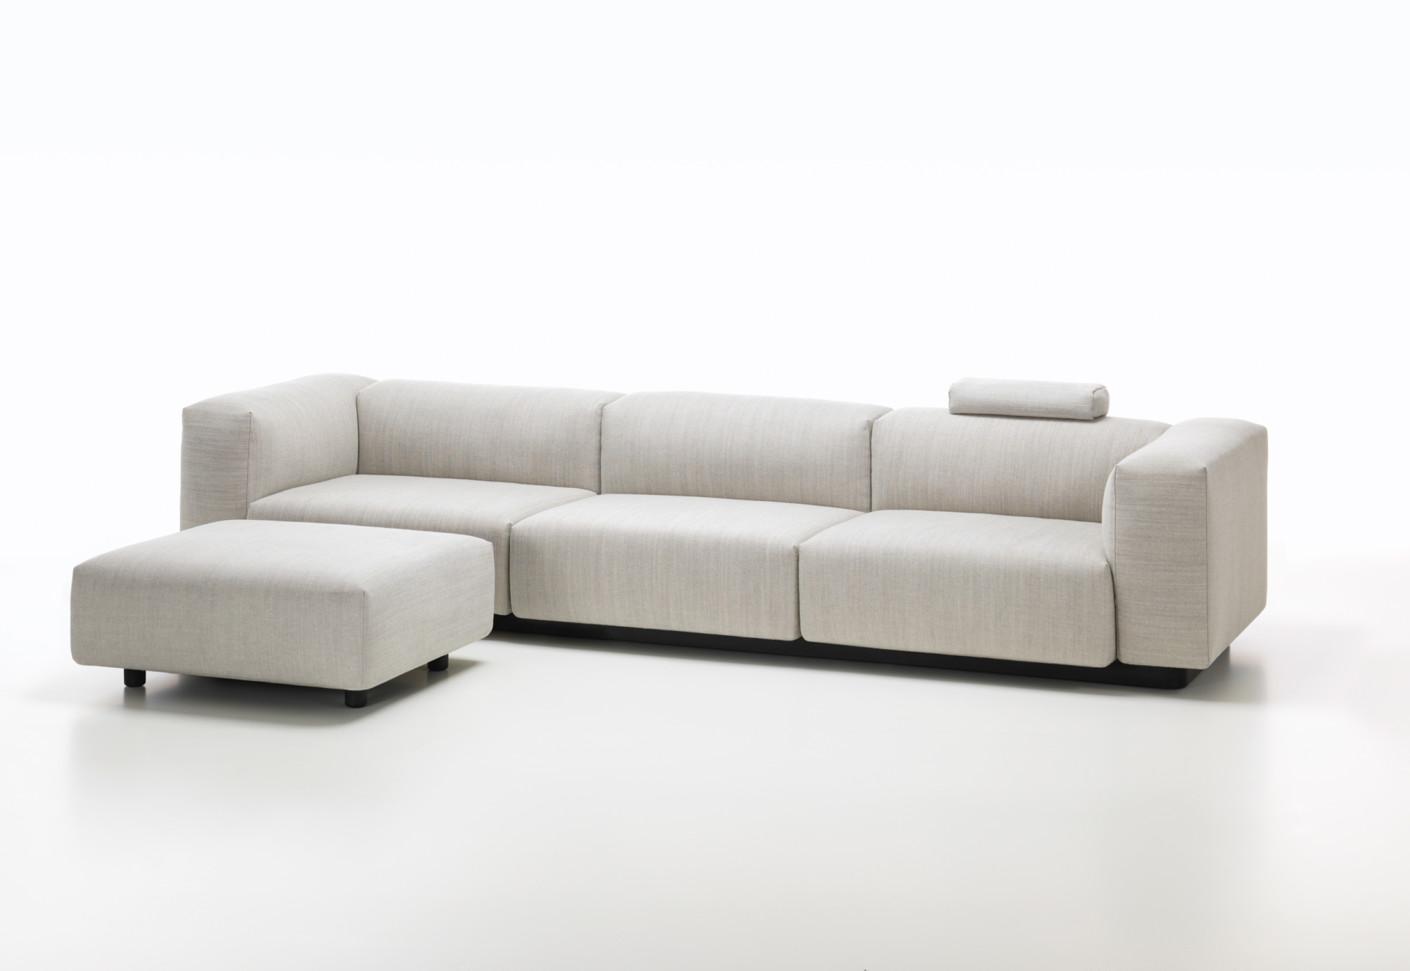 vitra sofa modular covers fabricland soft by stylepark